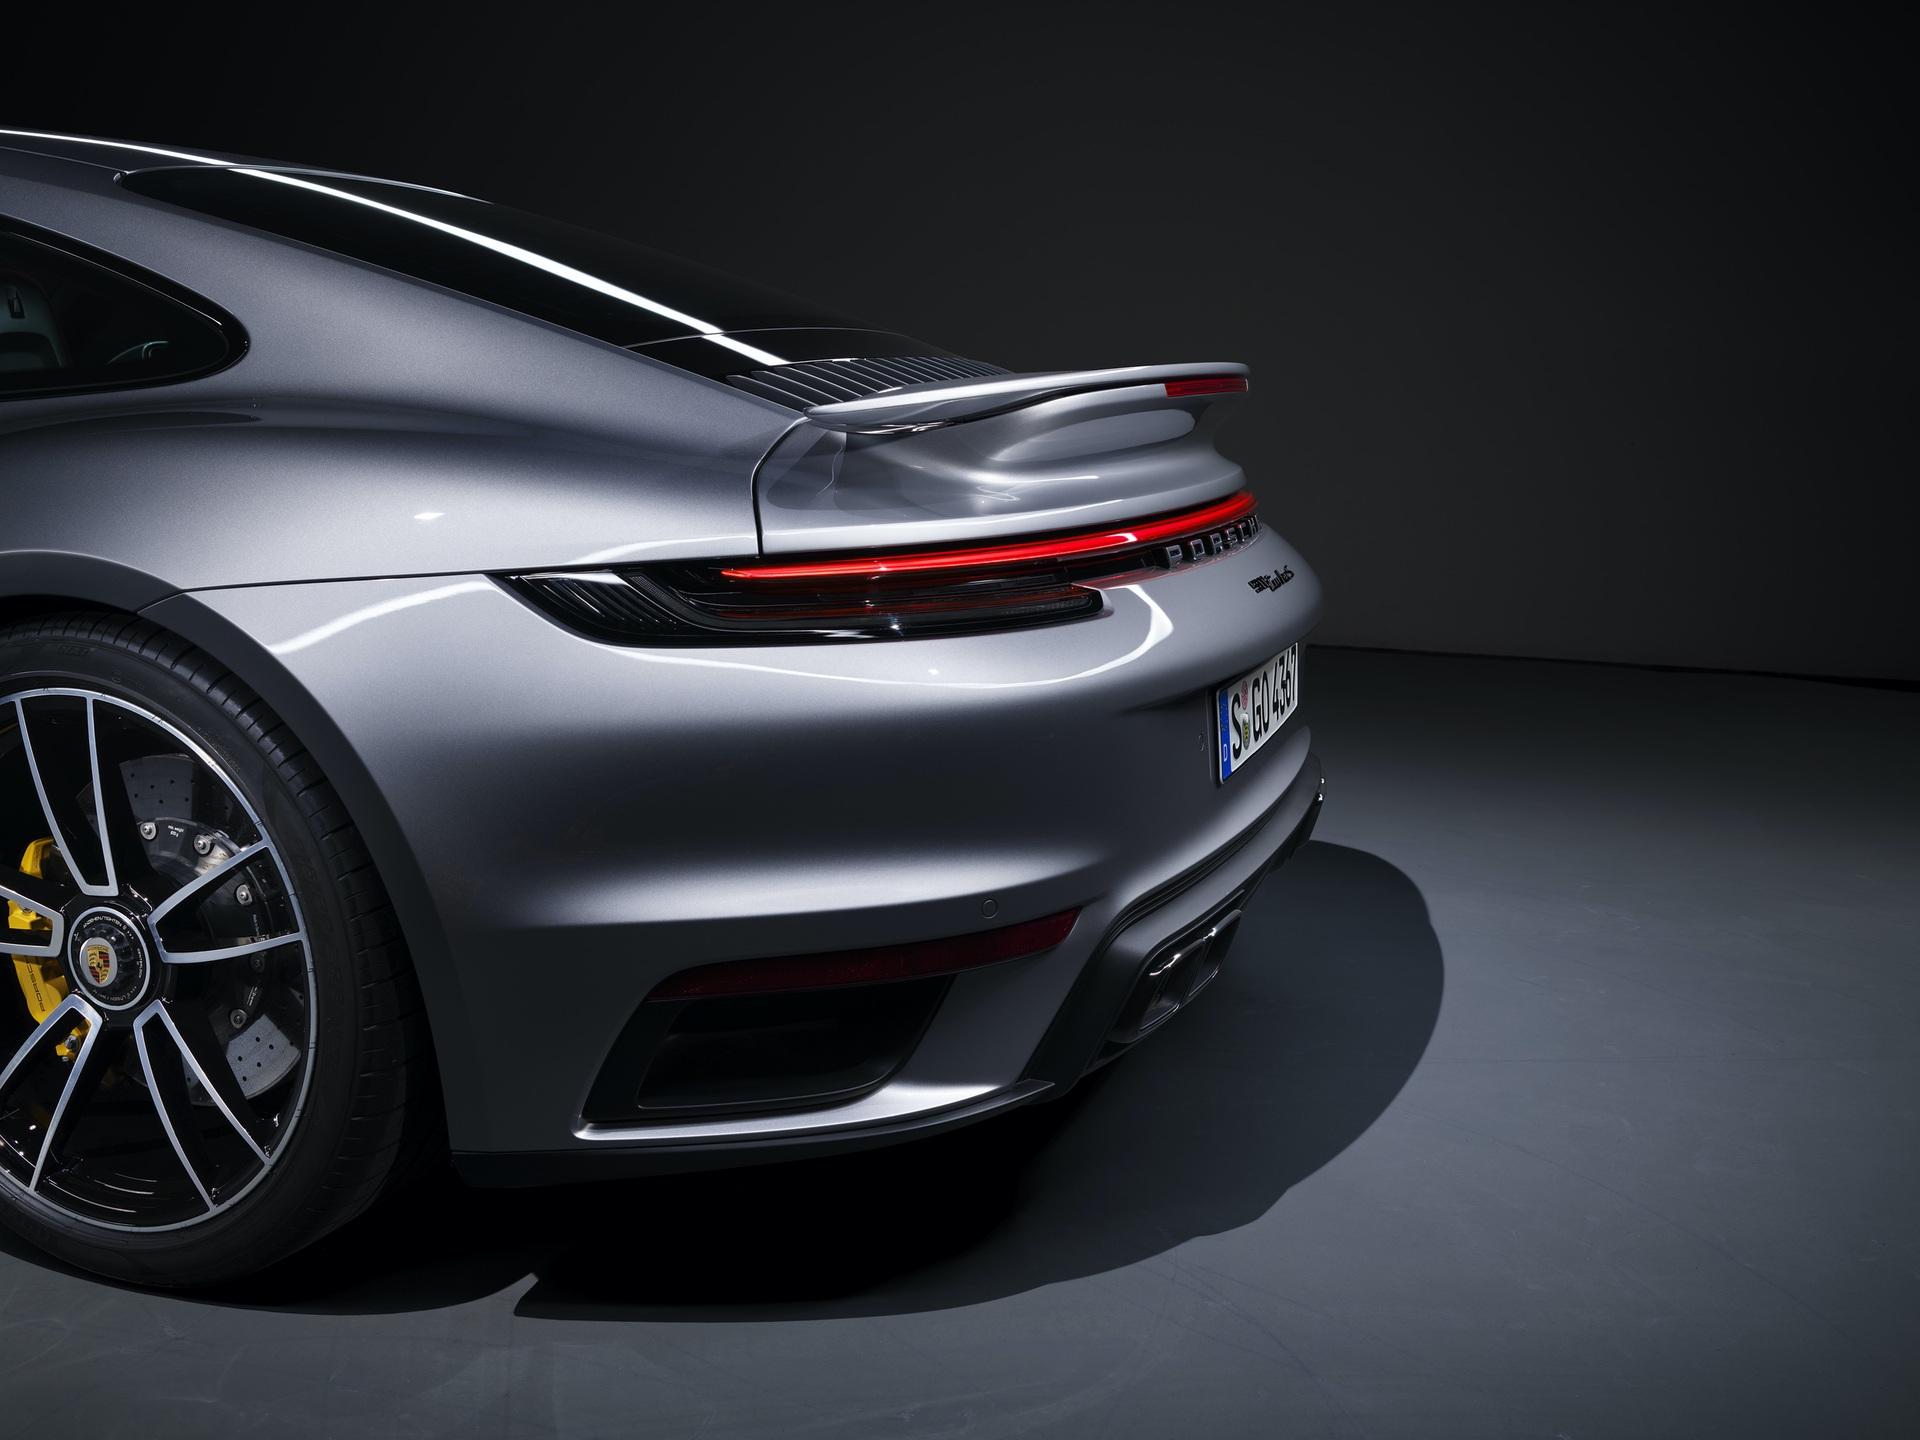 2020_Porsche_911-Turbo_S-aerodynamics_0013